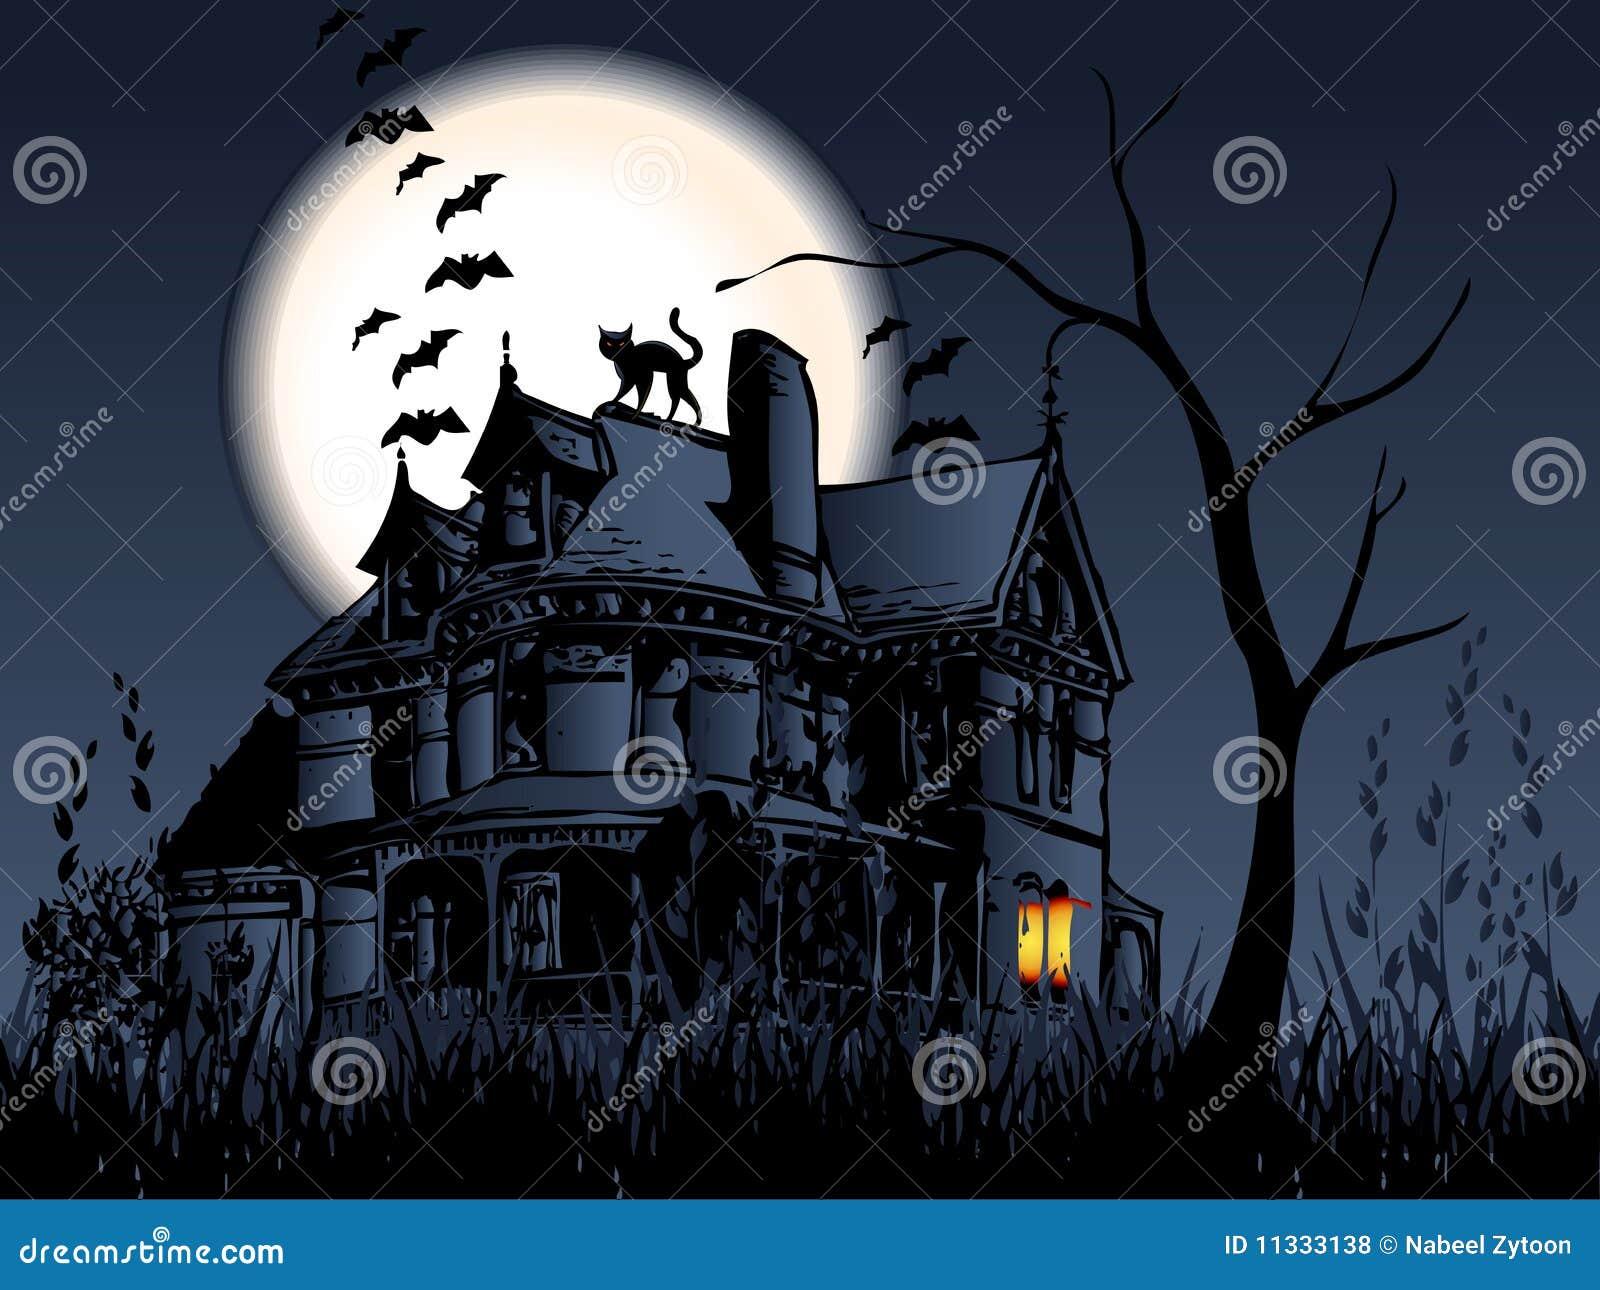 Halloween Concepet